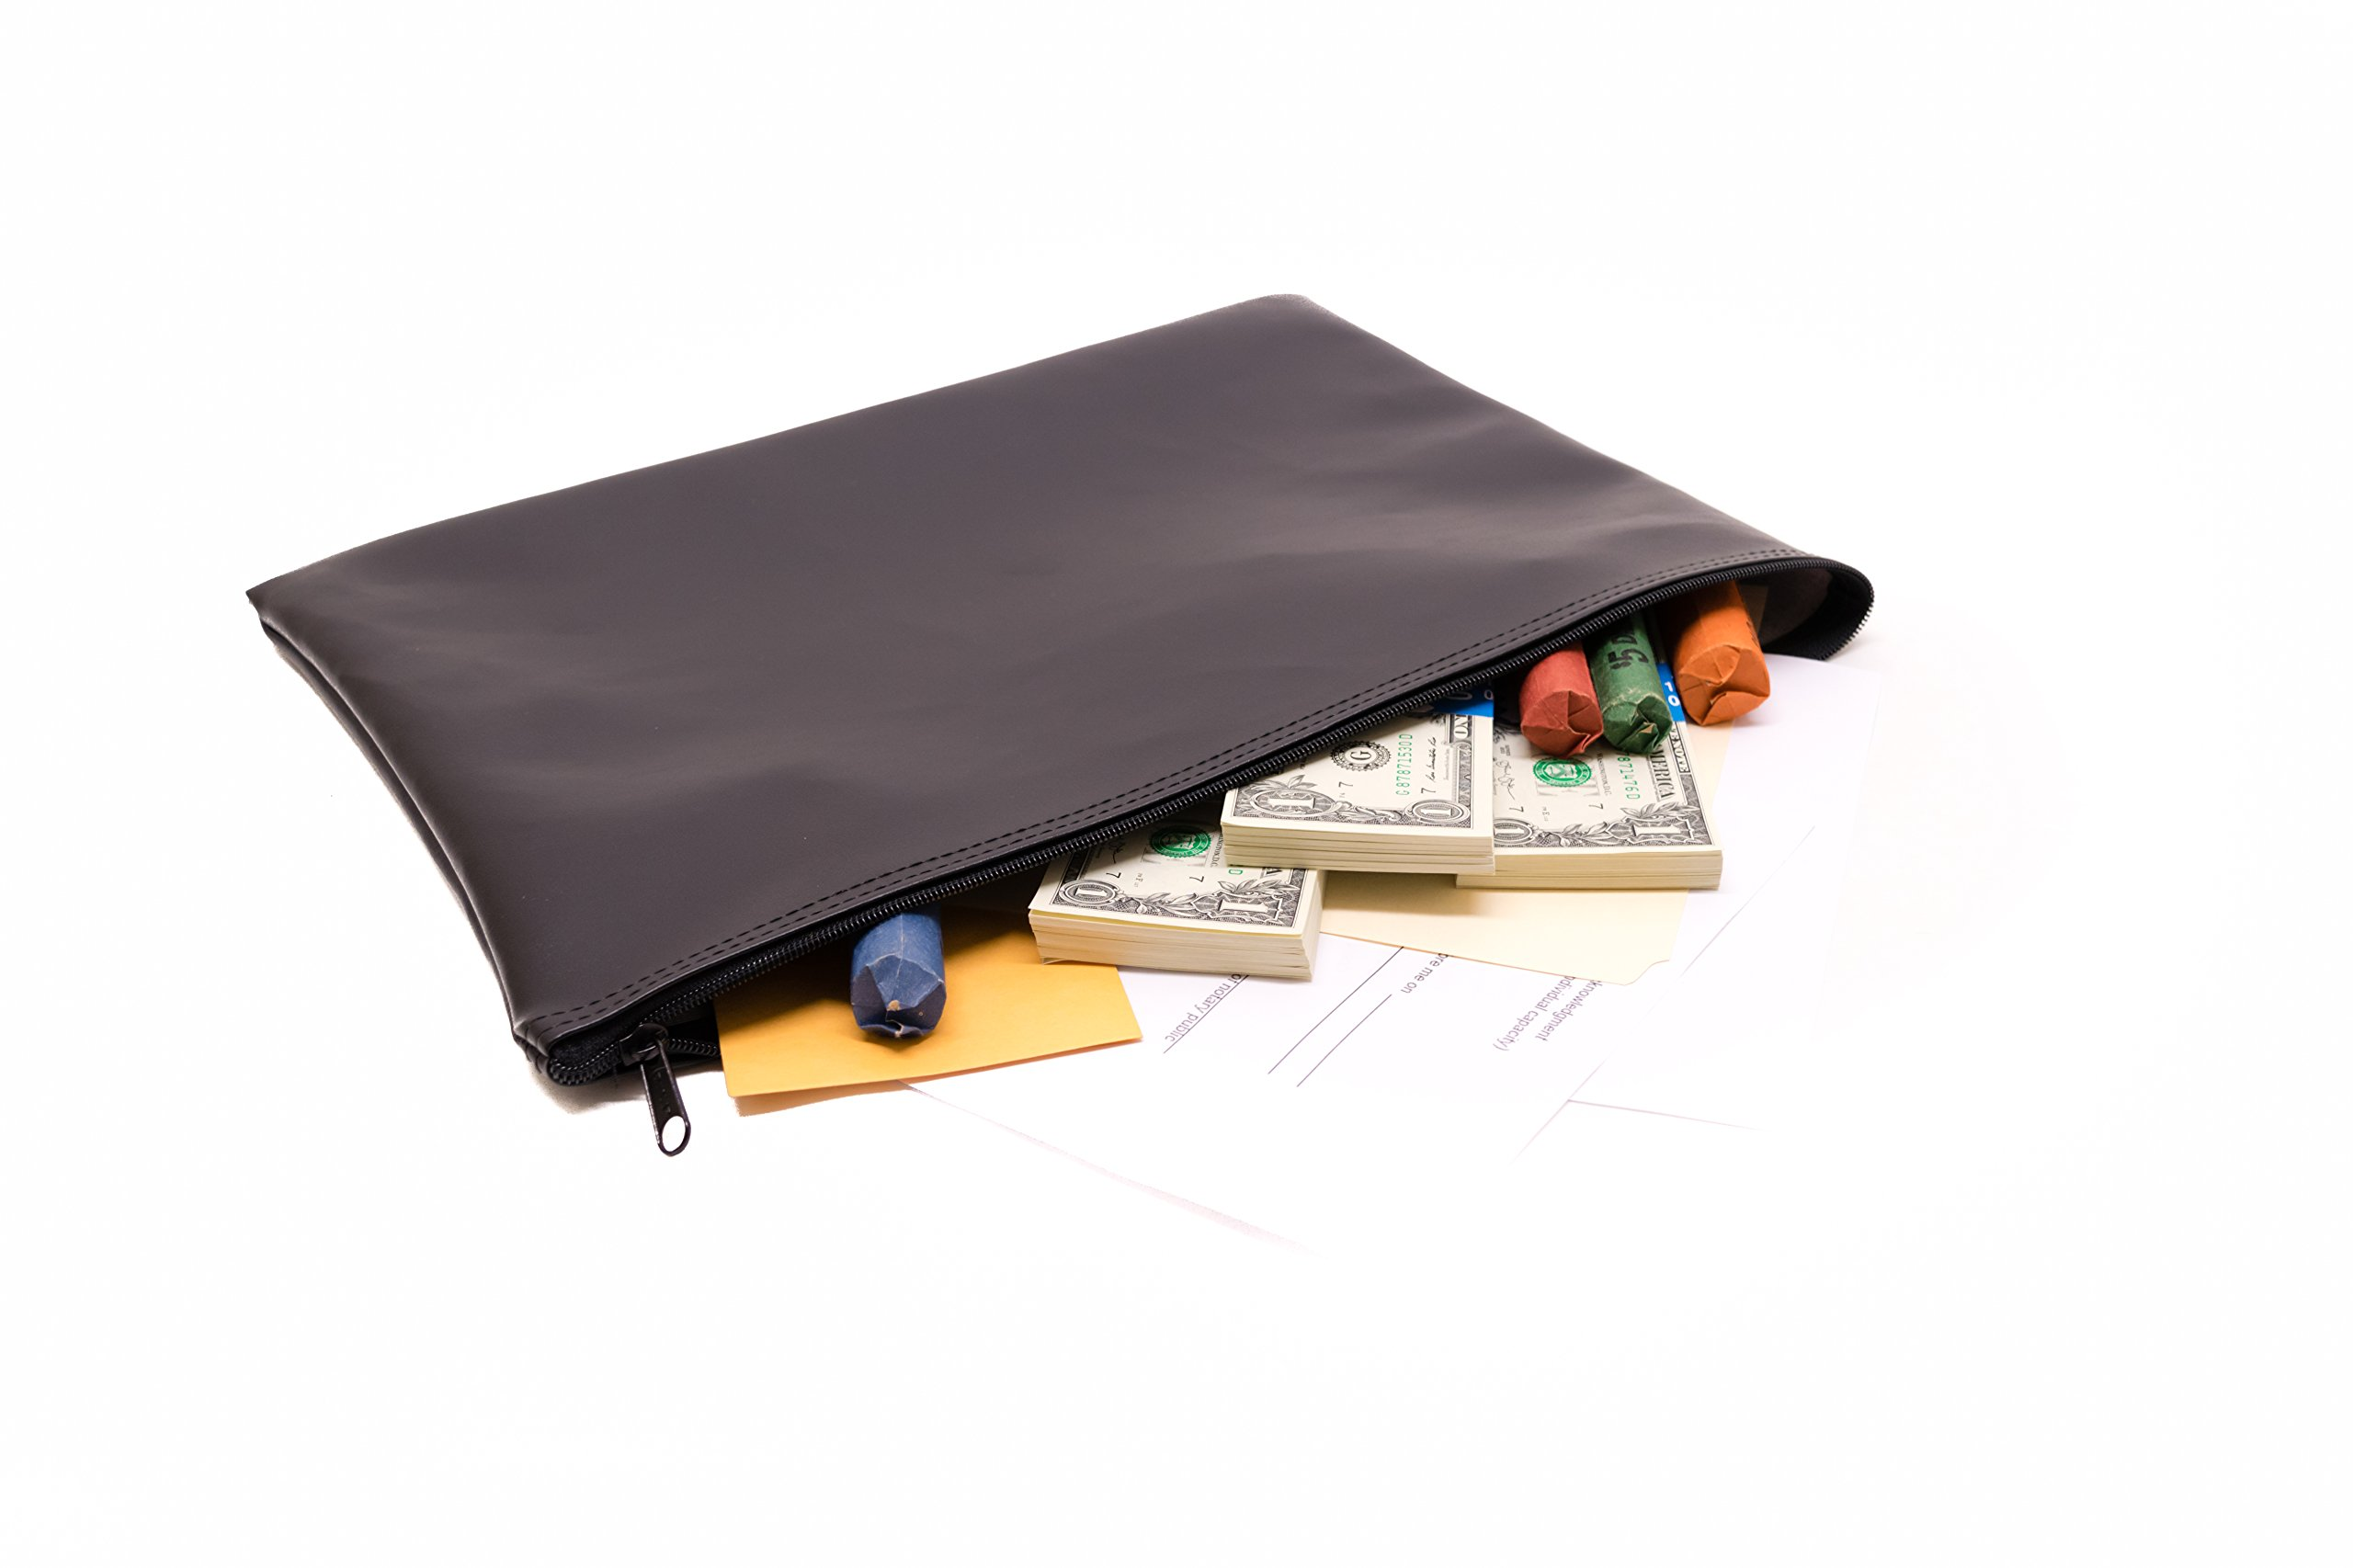 Zipper Bank Deposit Bag 12 X 16 Coin Check Money Wallet Black Pack of 5